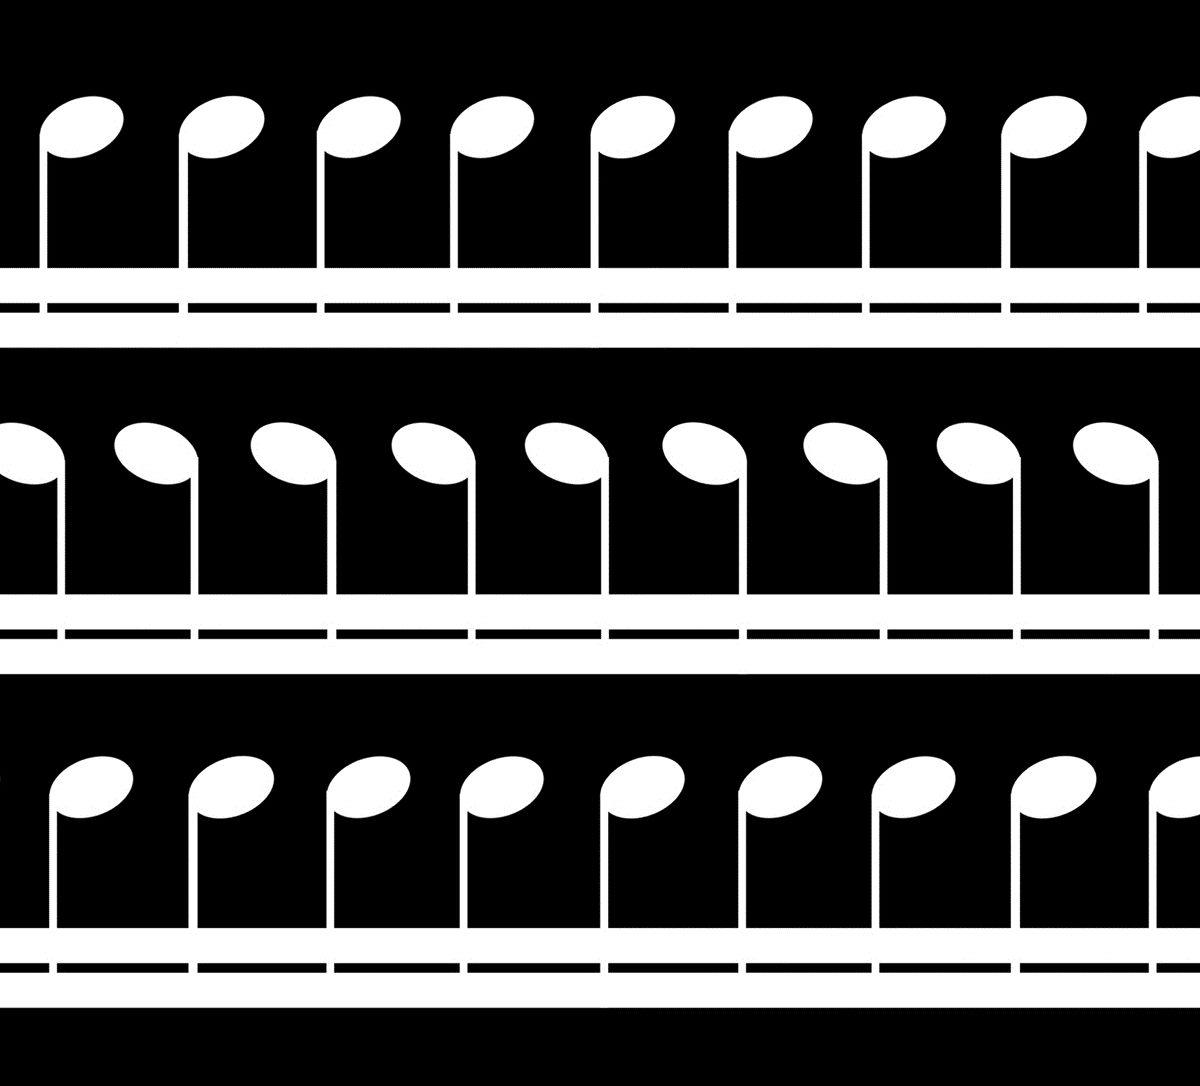 36. susreti ZG glazbenih amatera – 3. i 4. koncert ZBOROVI